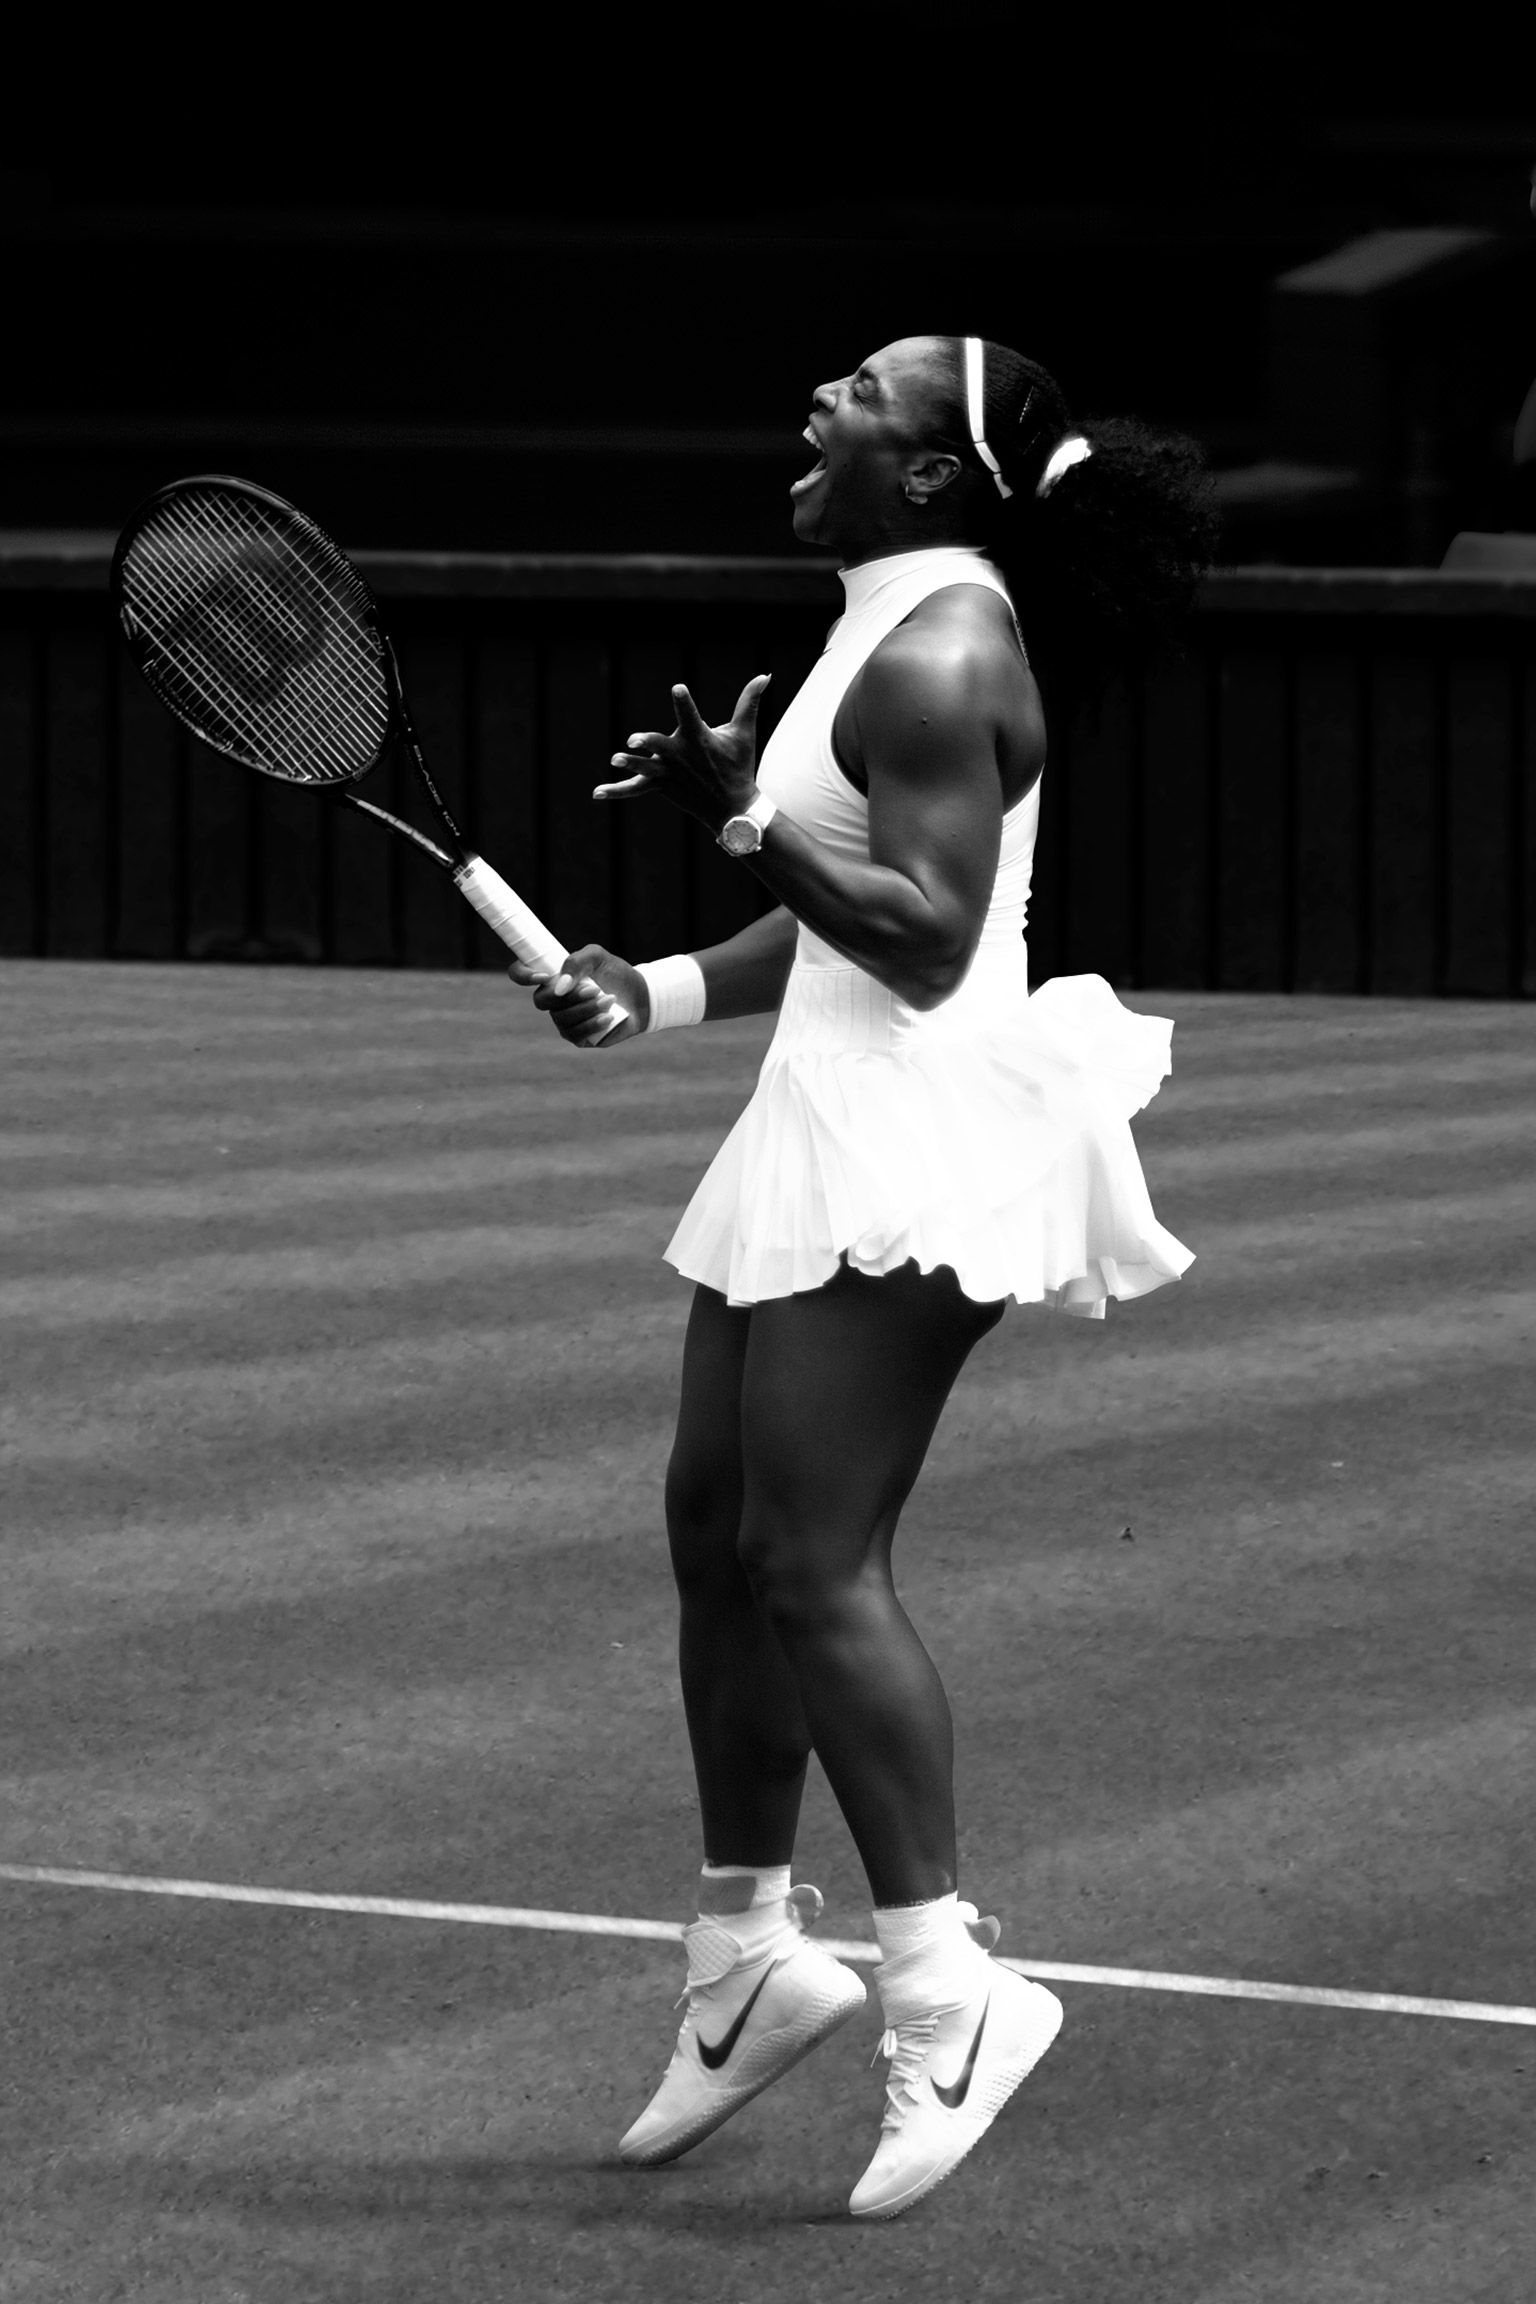 Nike Unlimited Serena Williamsová